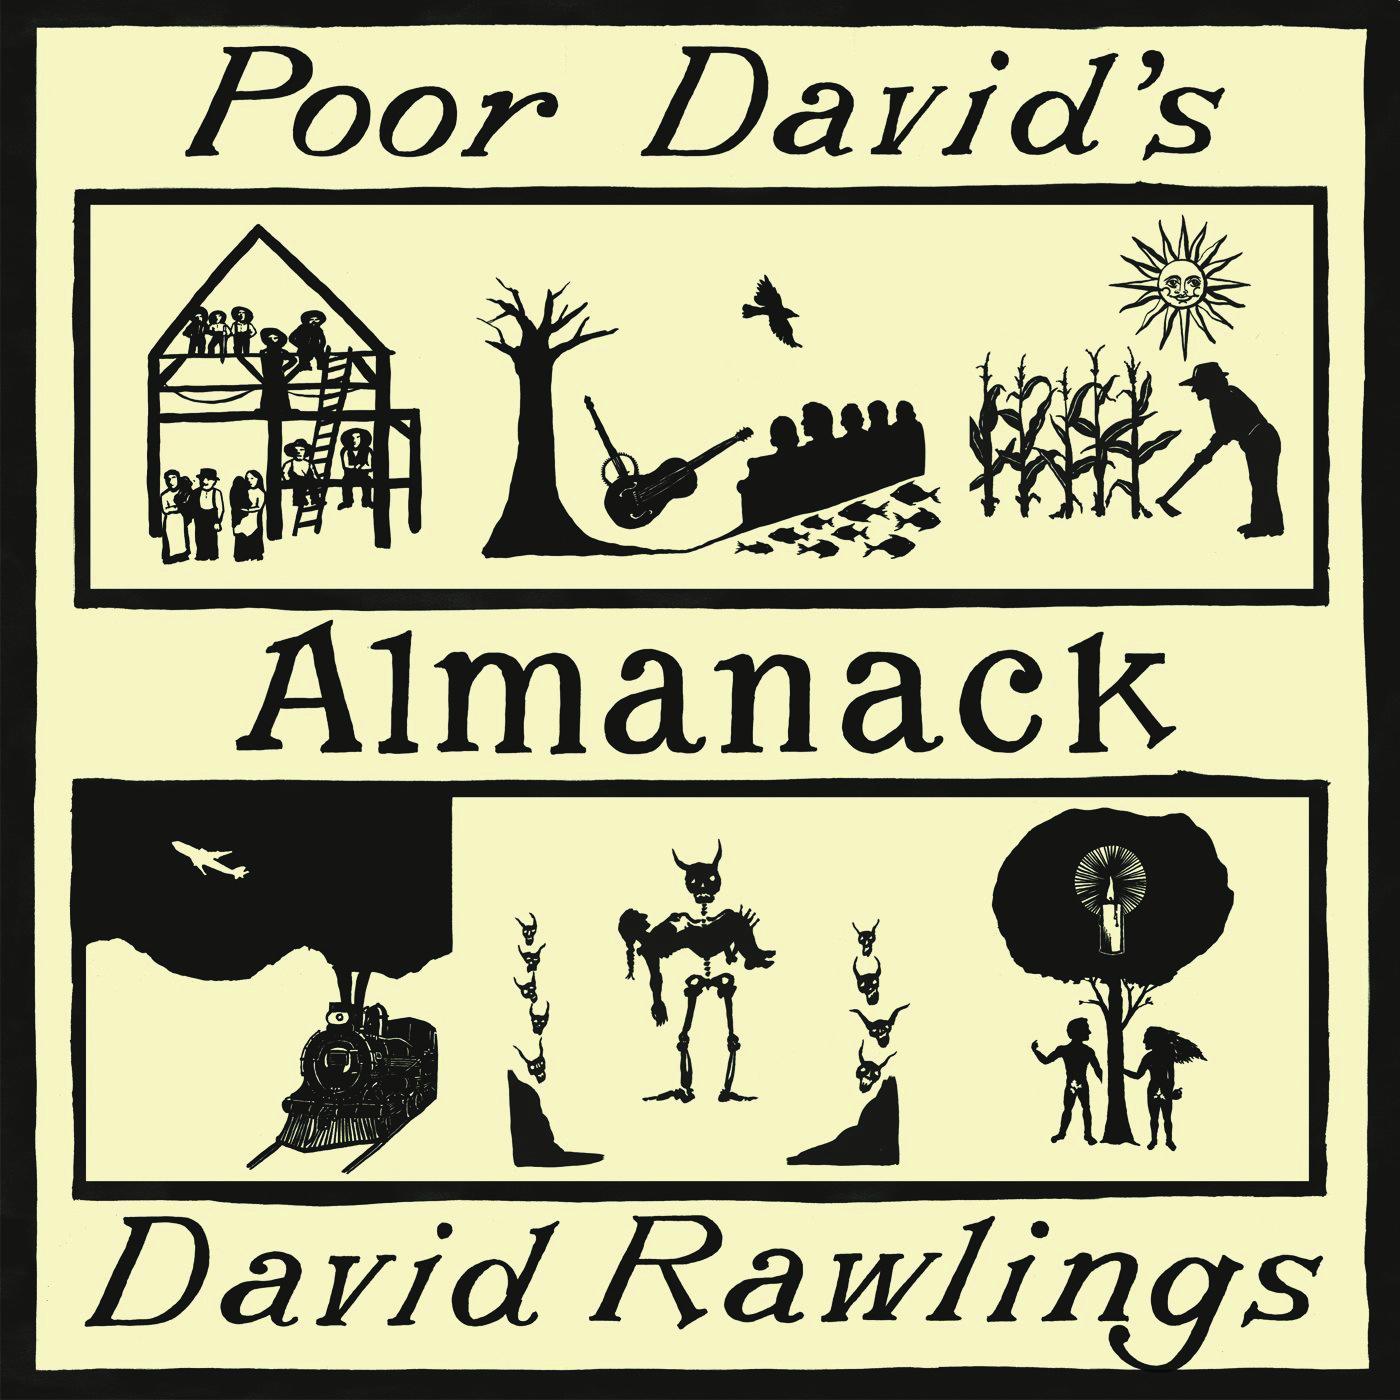 DavidRawlings album cover